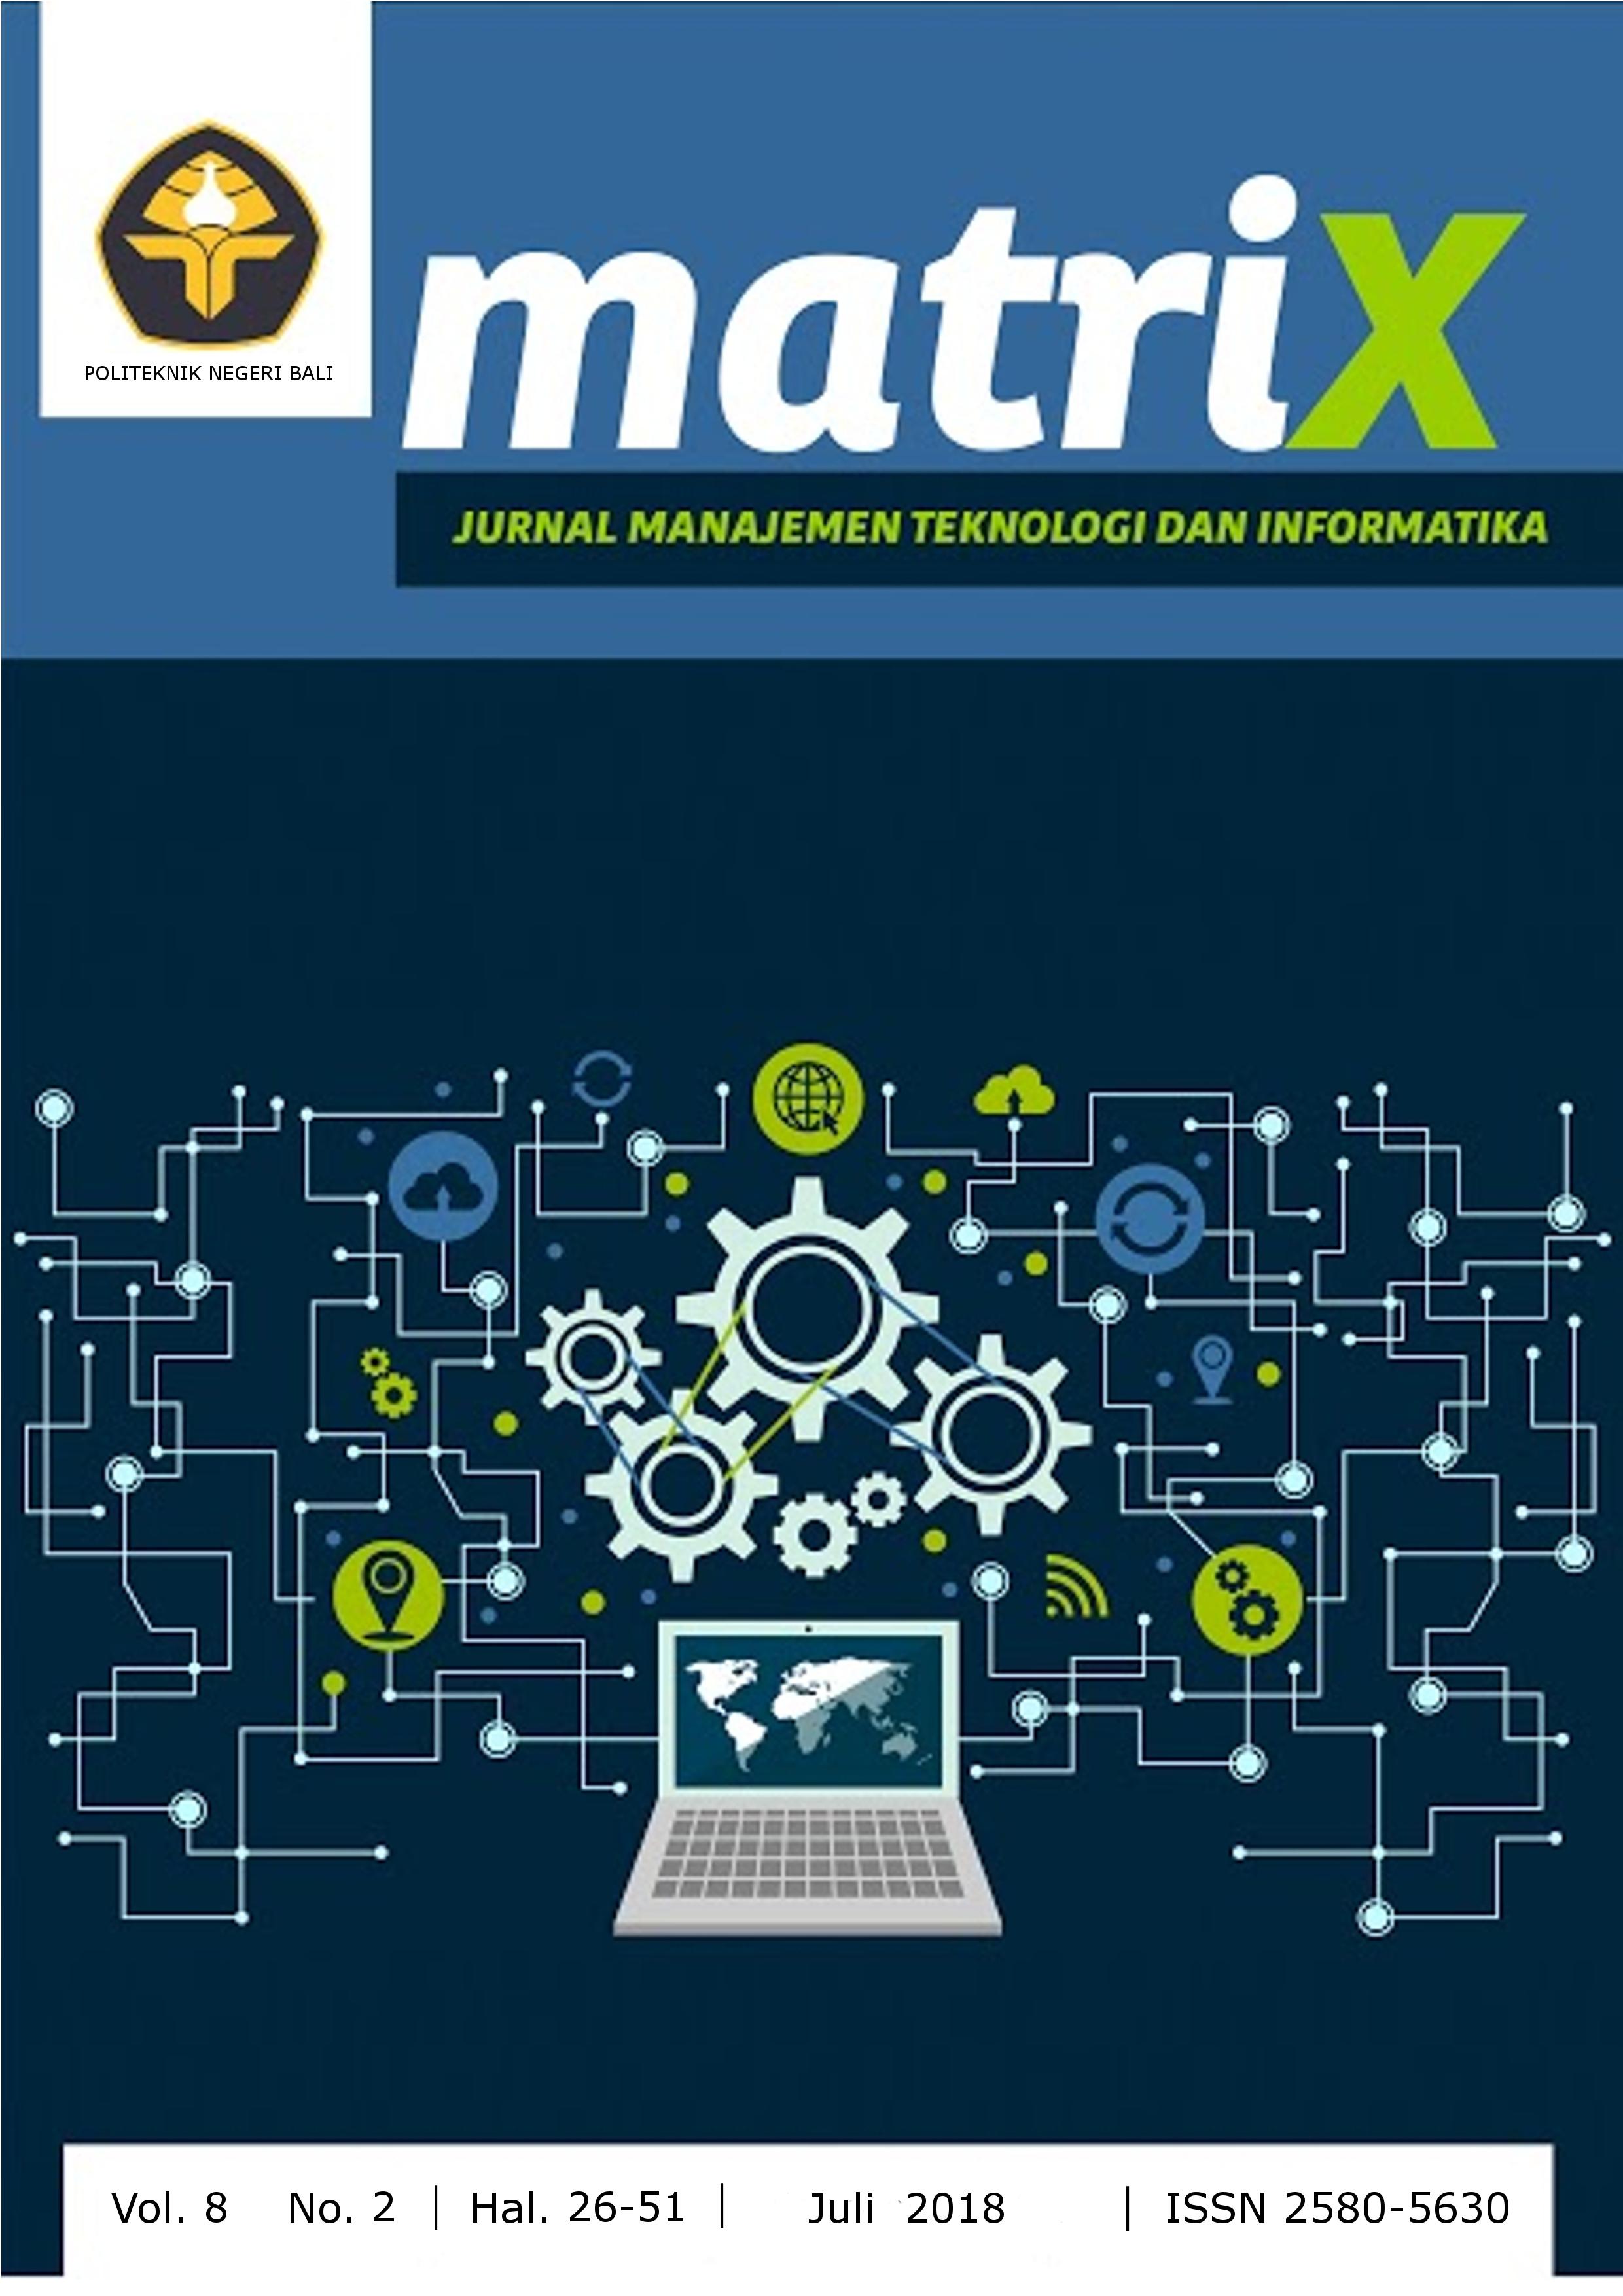 MATRIX : Volume 8, Nomor 2, Juli 2018